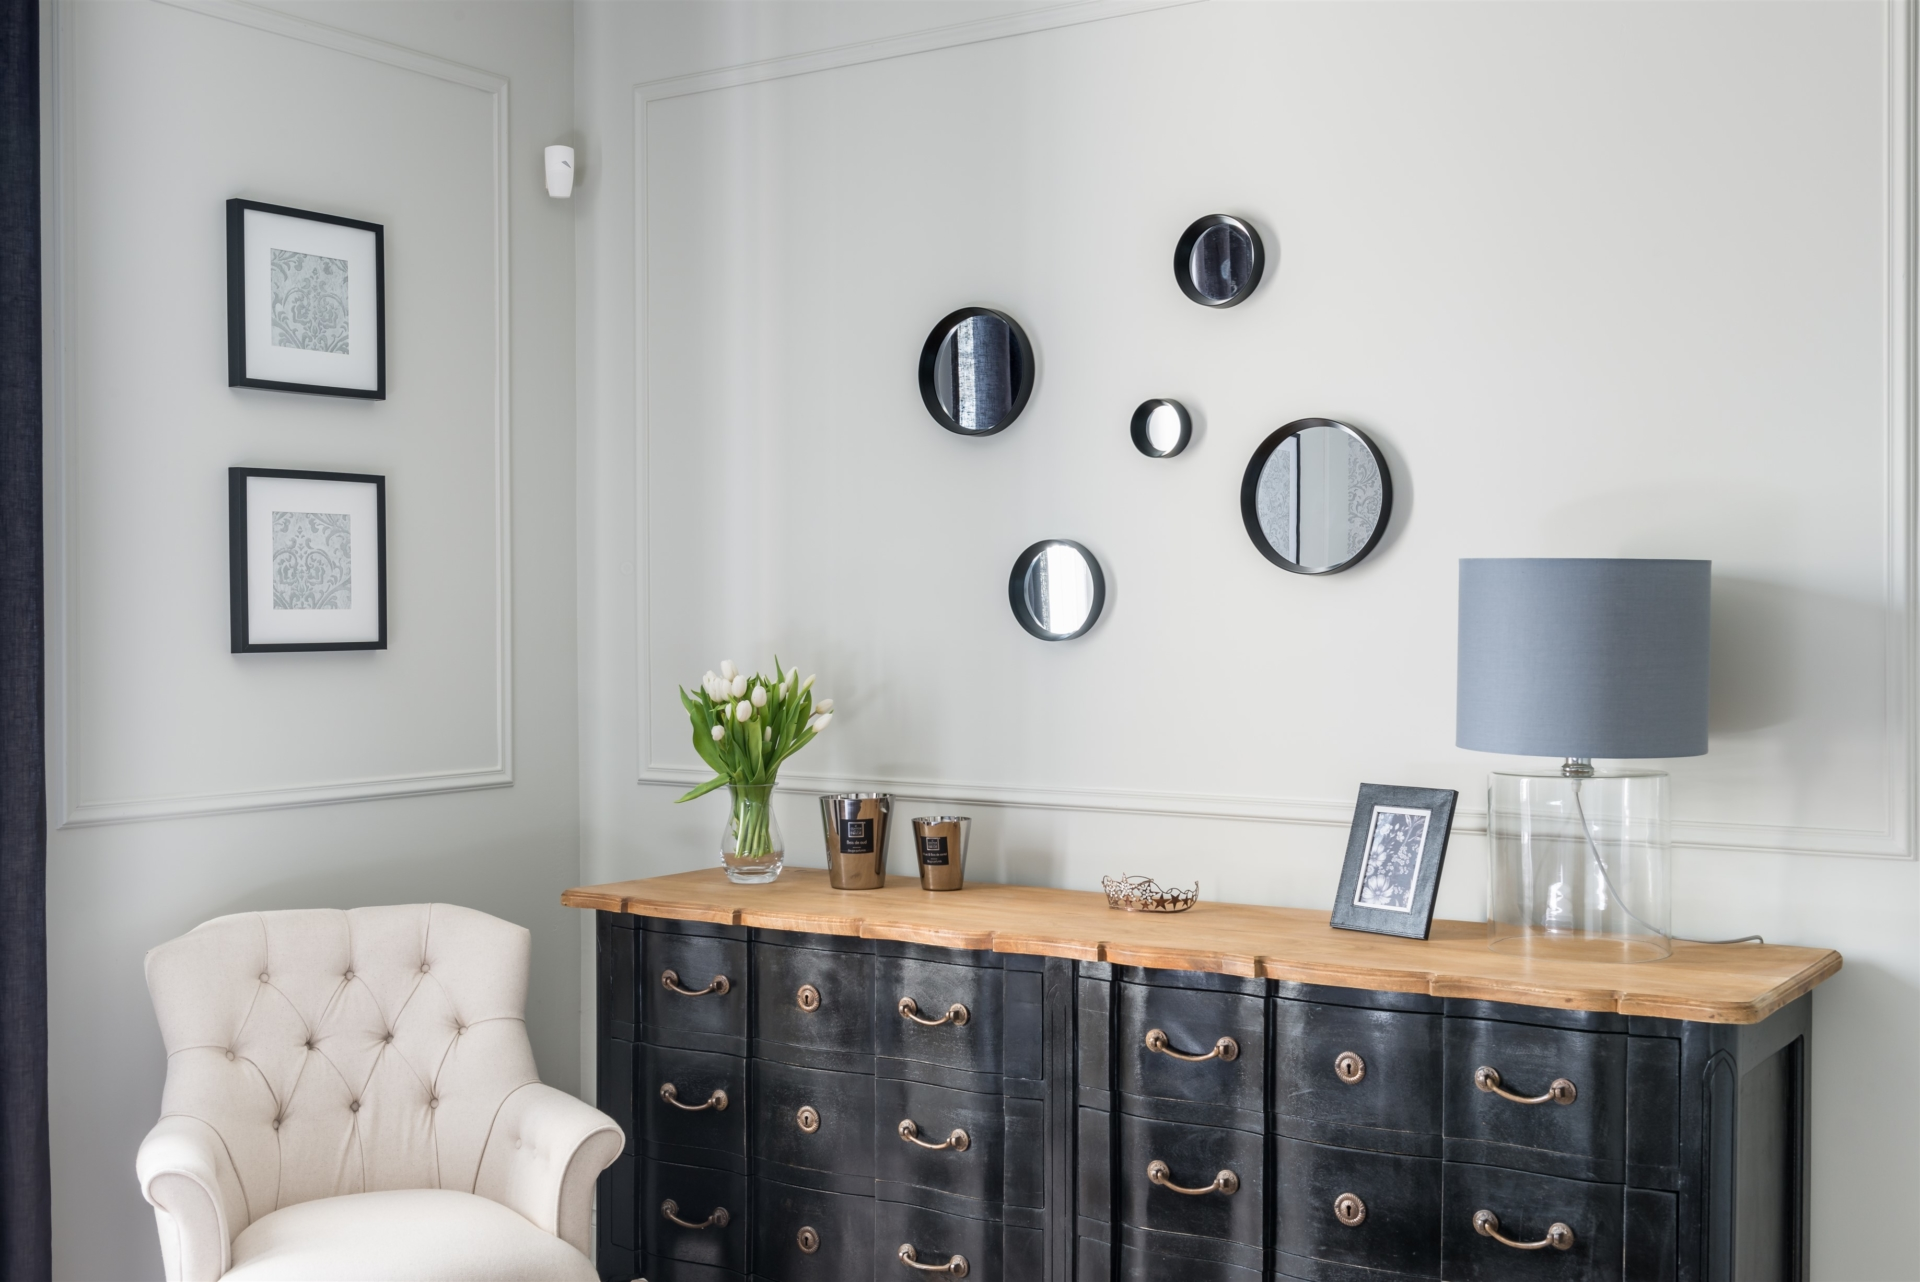 Chambre bureau gris noir u2022 by virginie vaudenay u2022 décoratrice ufdi 18 58